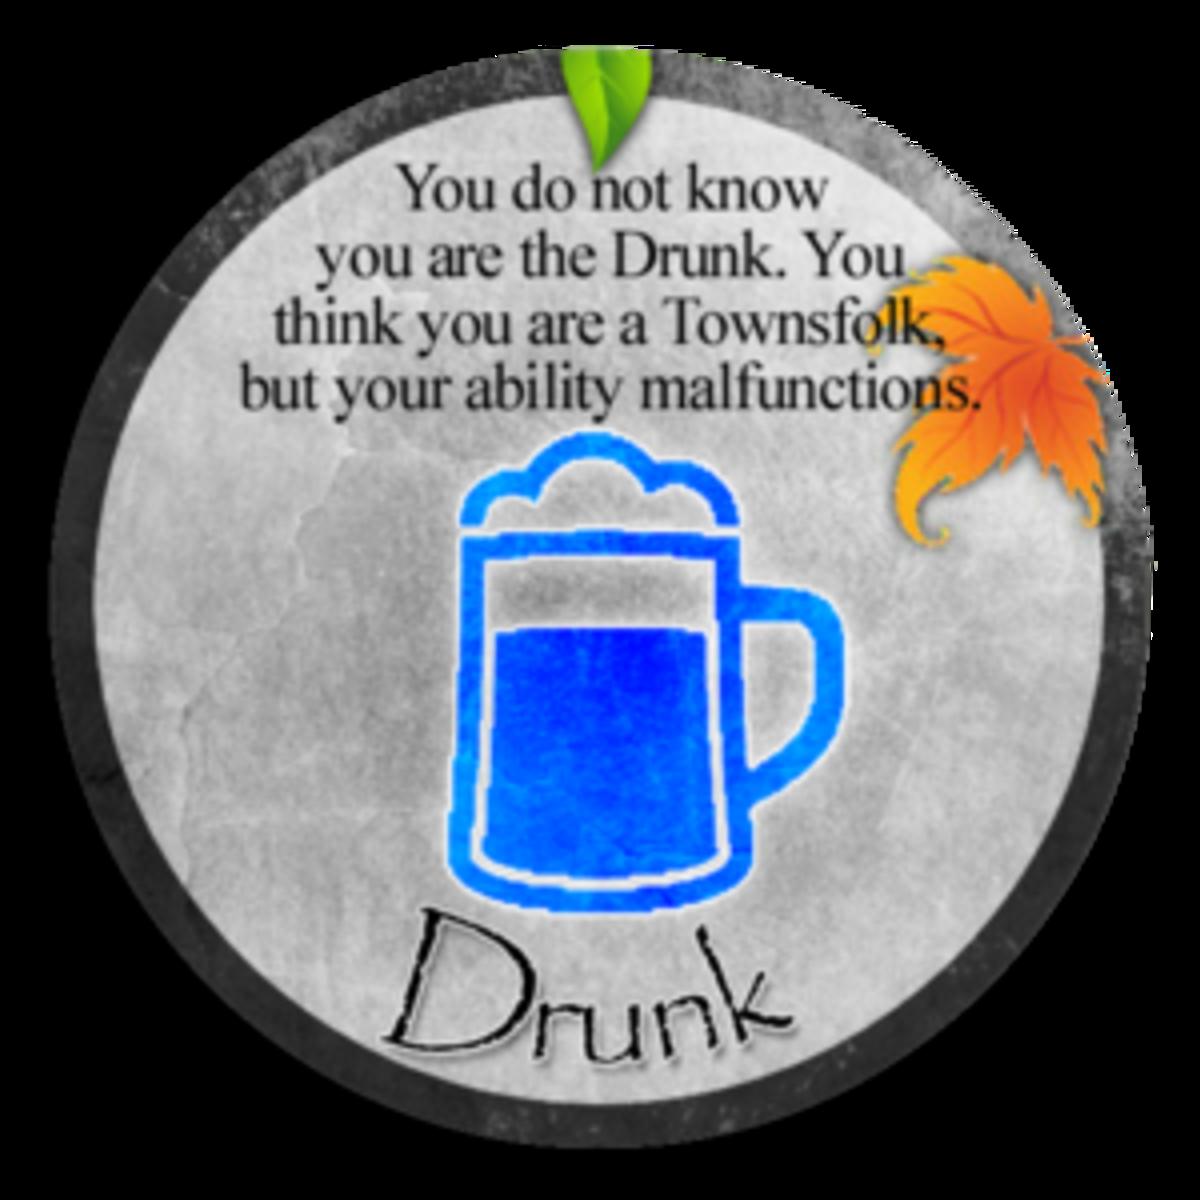 Clocktower's Drunk character